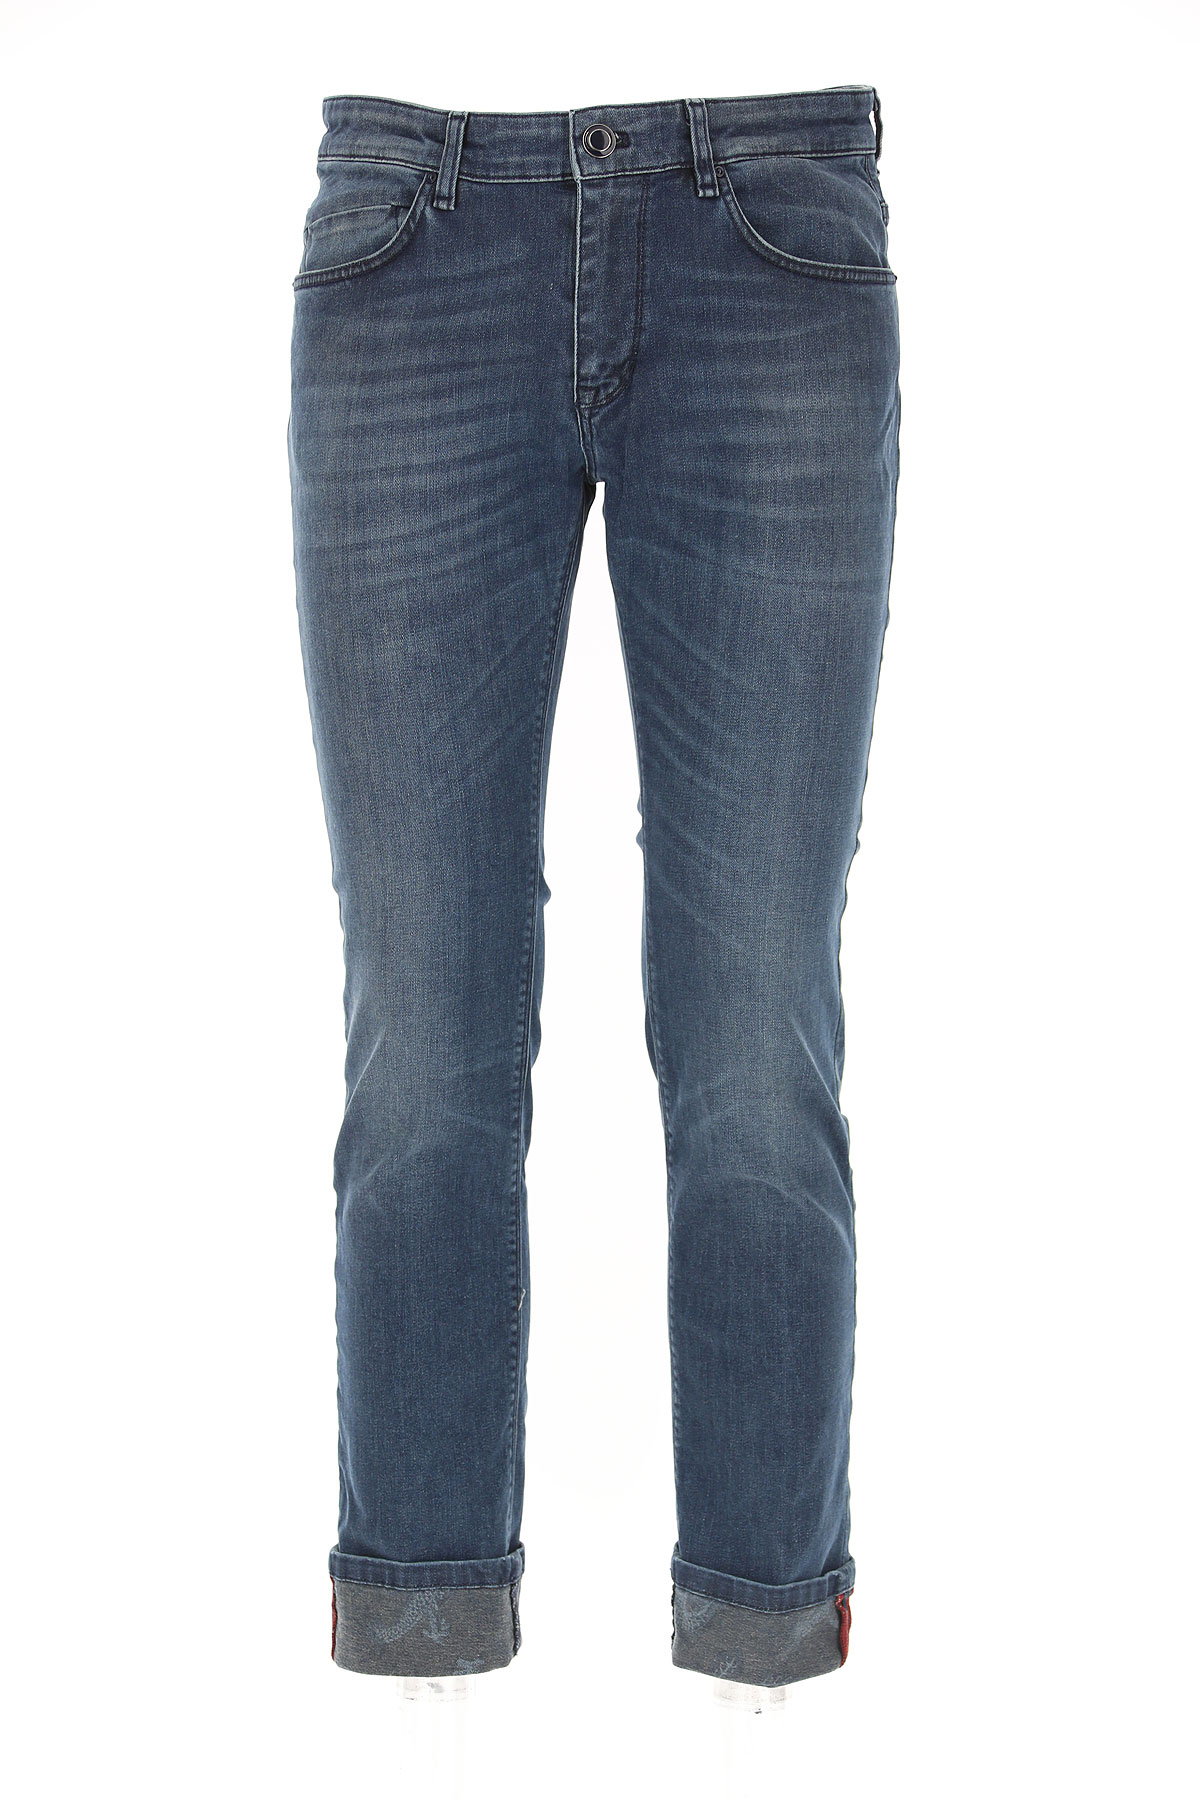 Image of Masons Jeans, Denim Blue, Cotton, 2017, 30 32 34 36